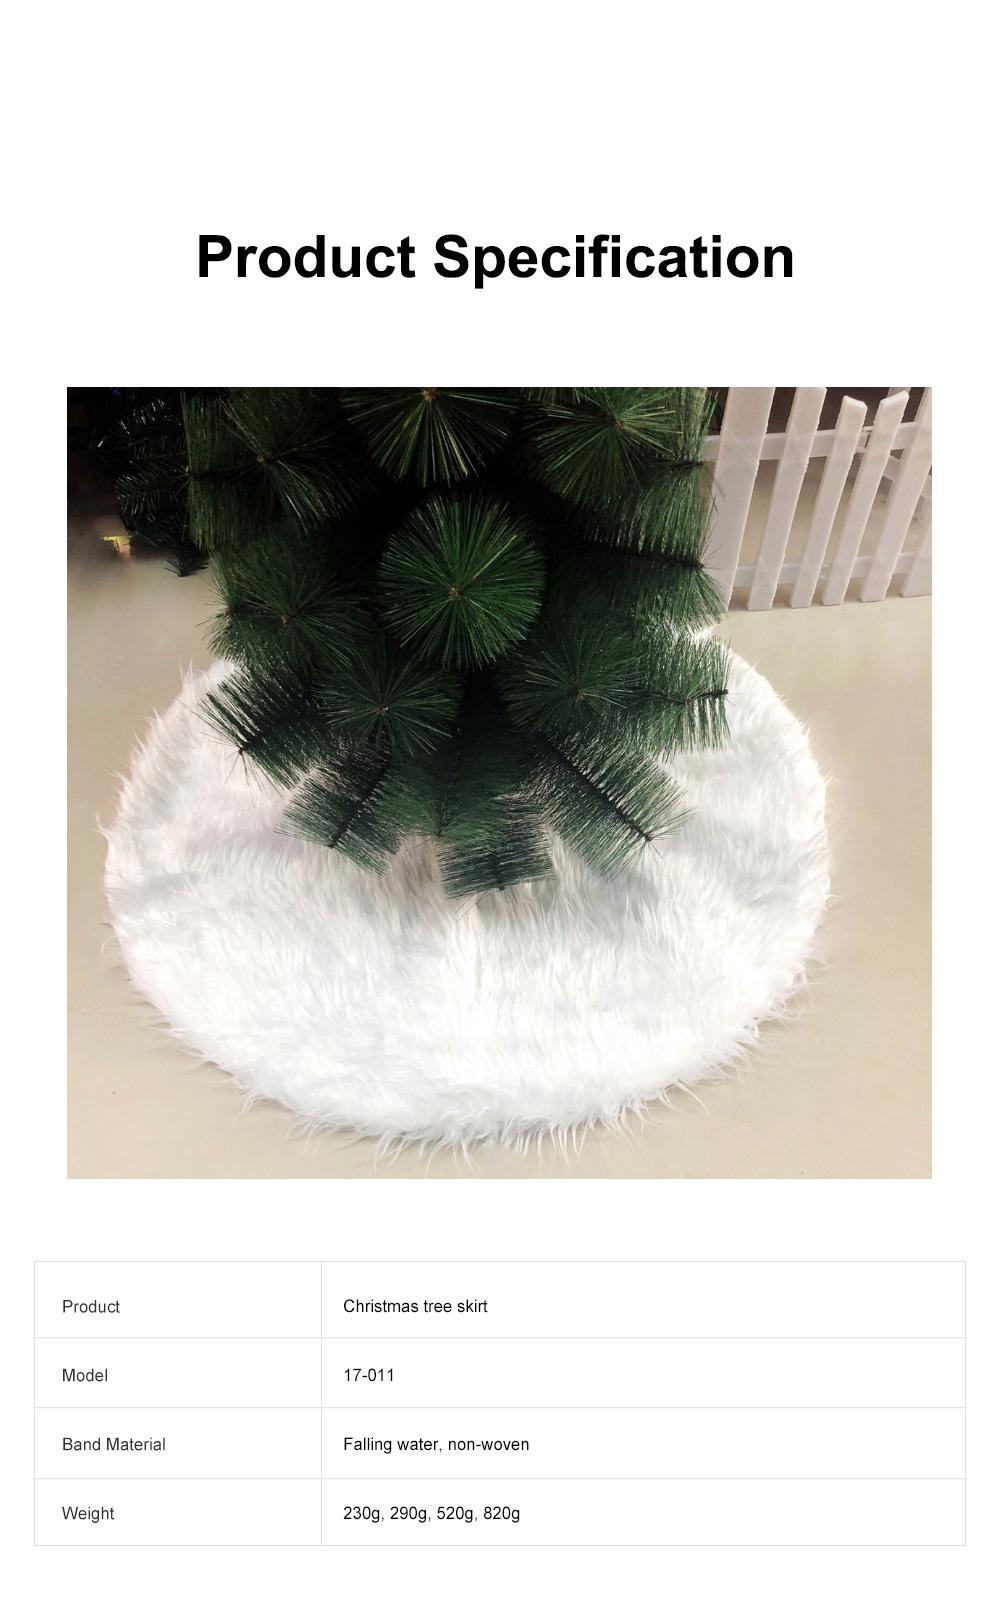 Long Snow Plush Christmas Tree Skirt Non Wovens Cotton Golden Ruffle Edge Base Floor Mat Cover New Year Xmas Party Decoration 6